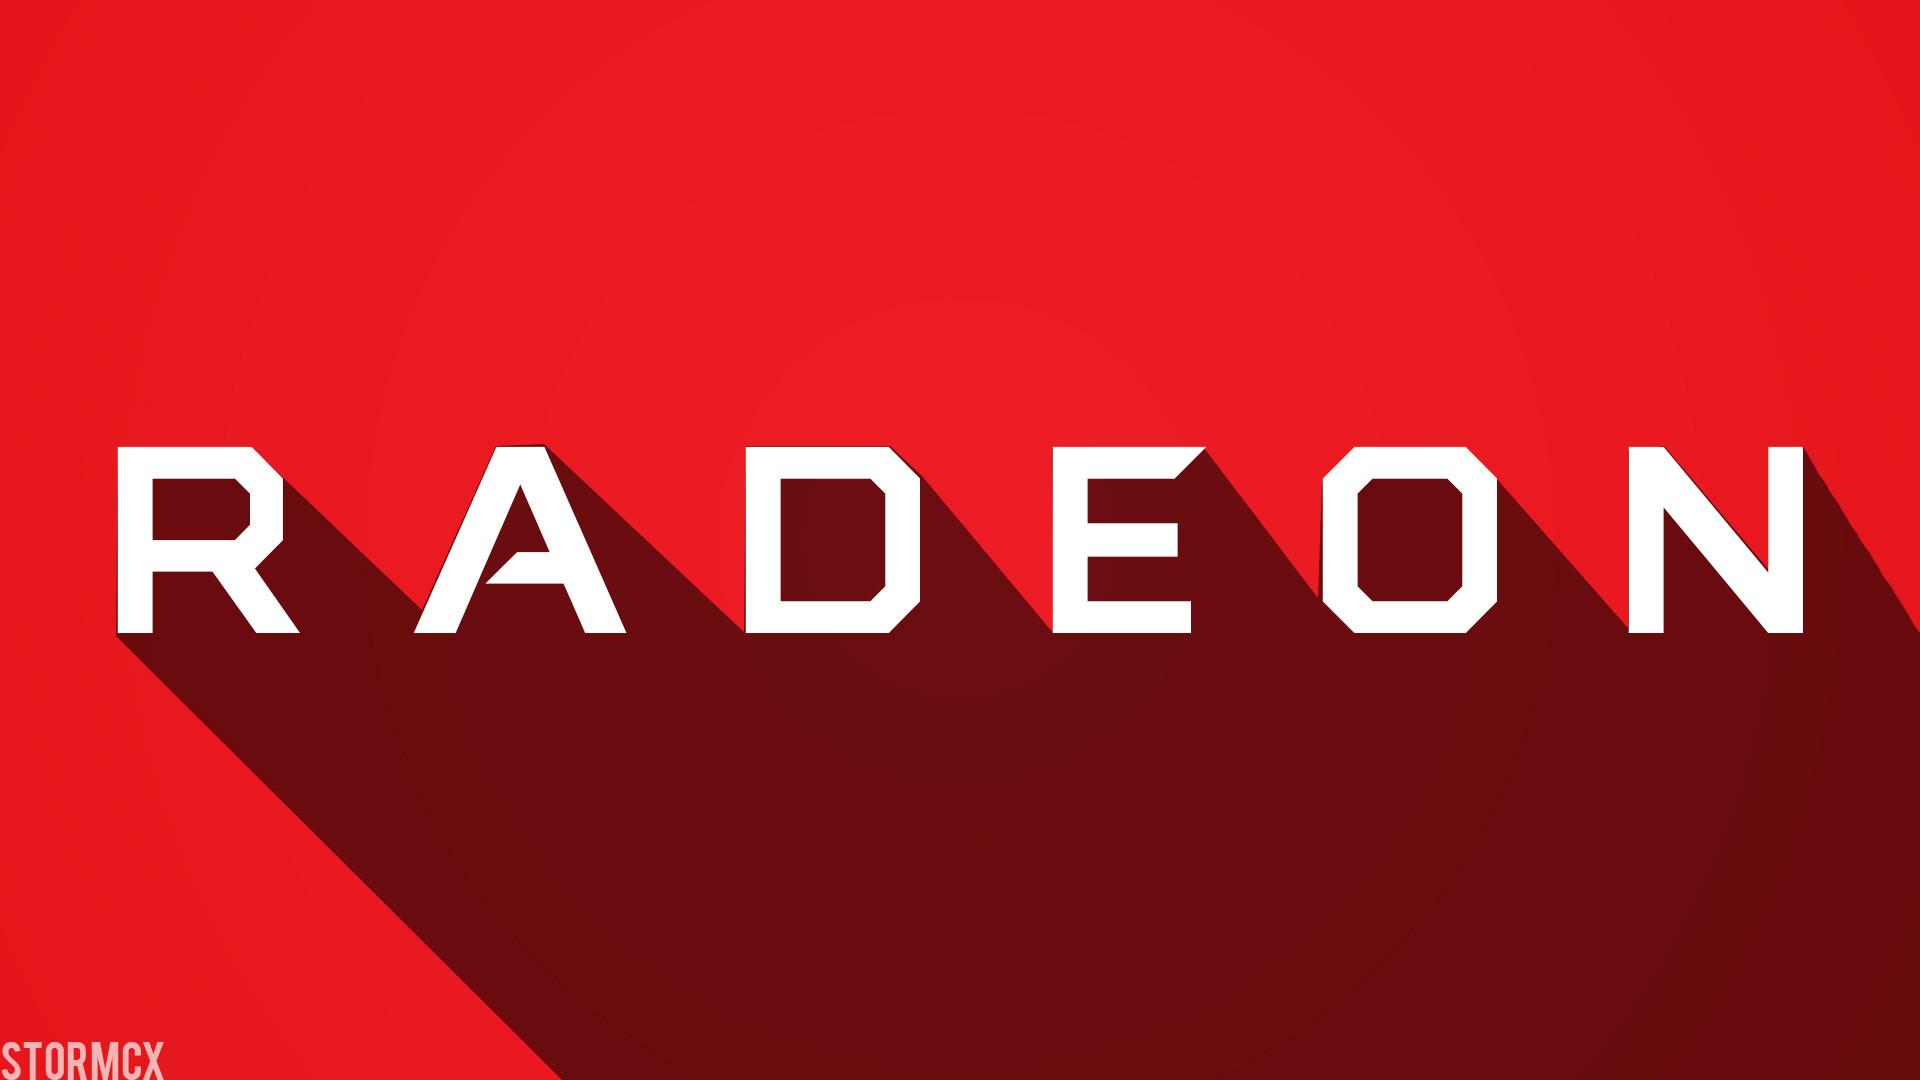 Amd Radeon Wallpaper